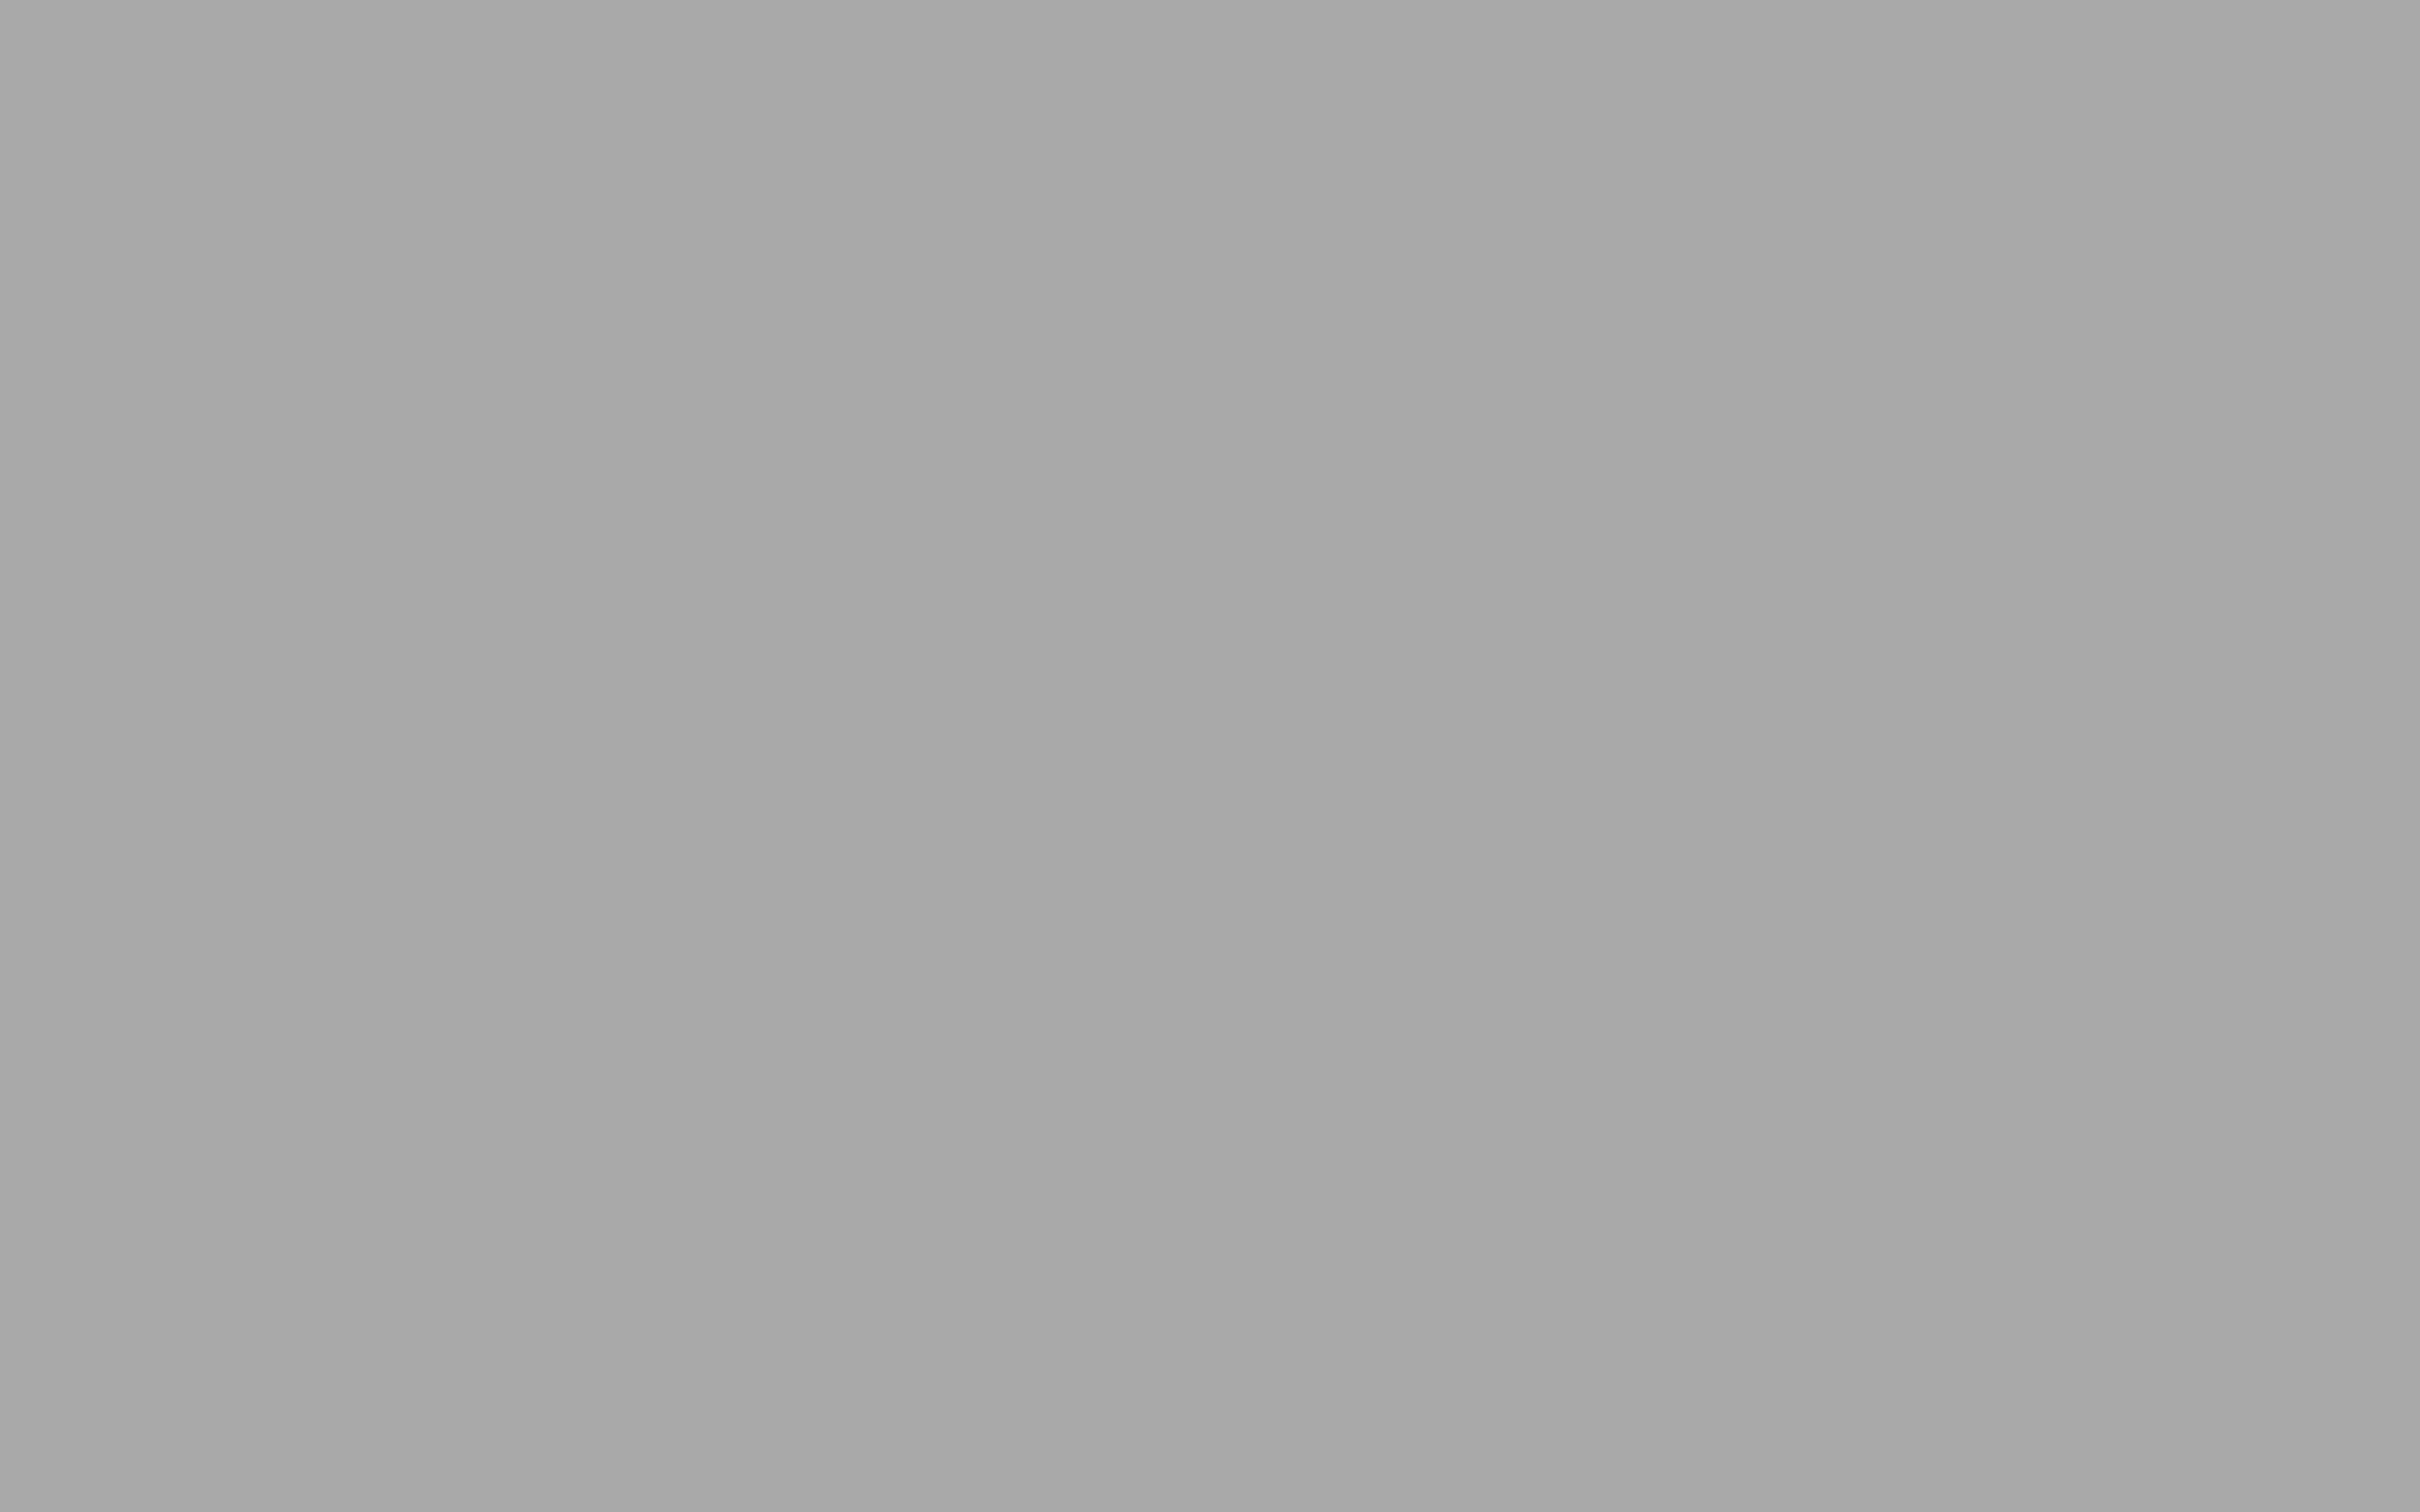 2560x1600 Dark Gray Solid Color Background